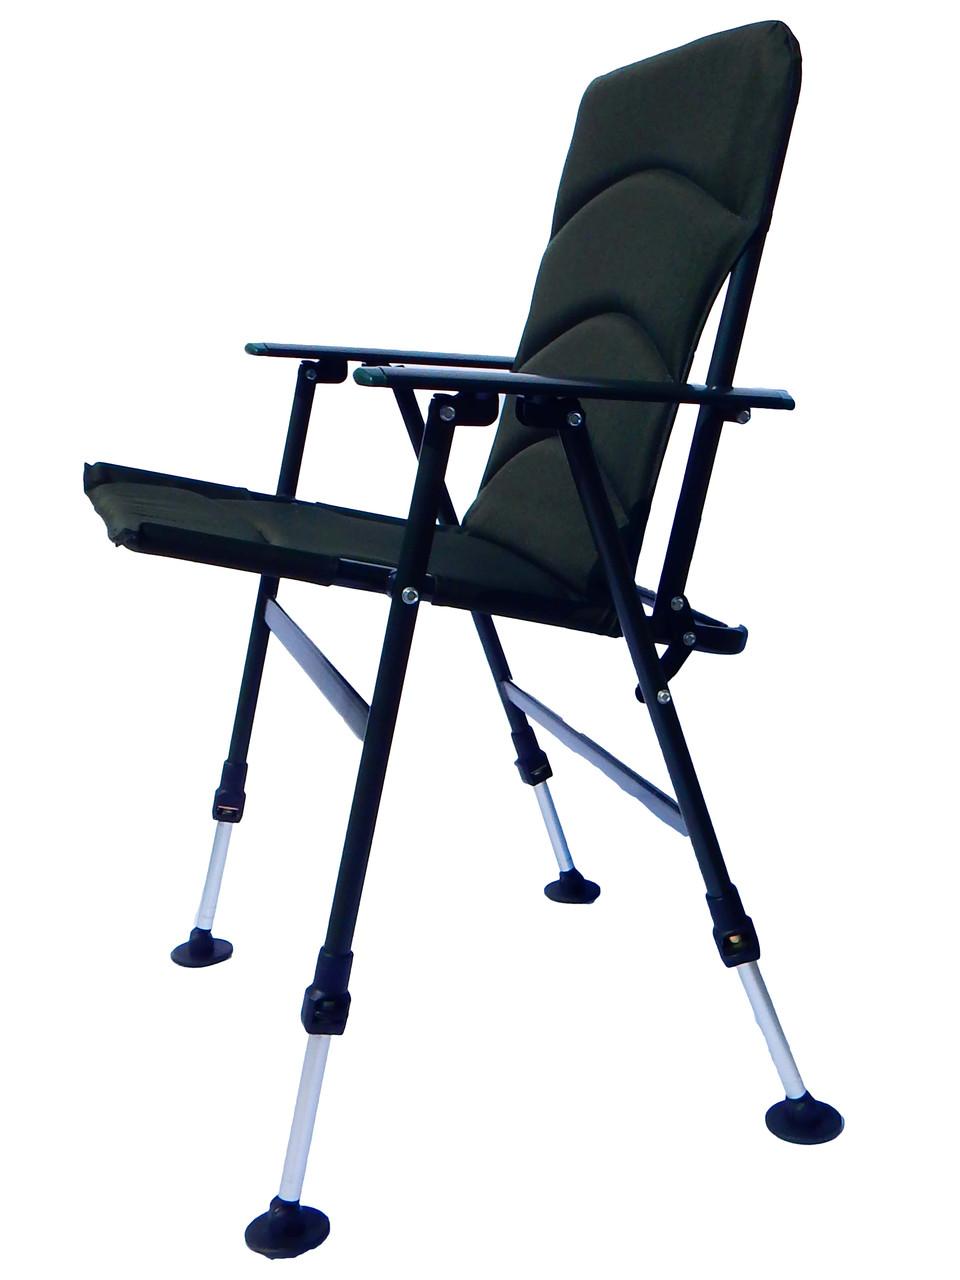 Карповое кресло Ranger Fisherman, раскладное кресло, кресло карповое, рыбацкое кресло